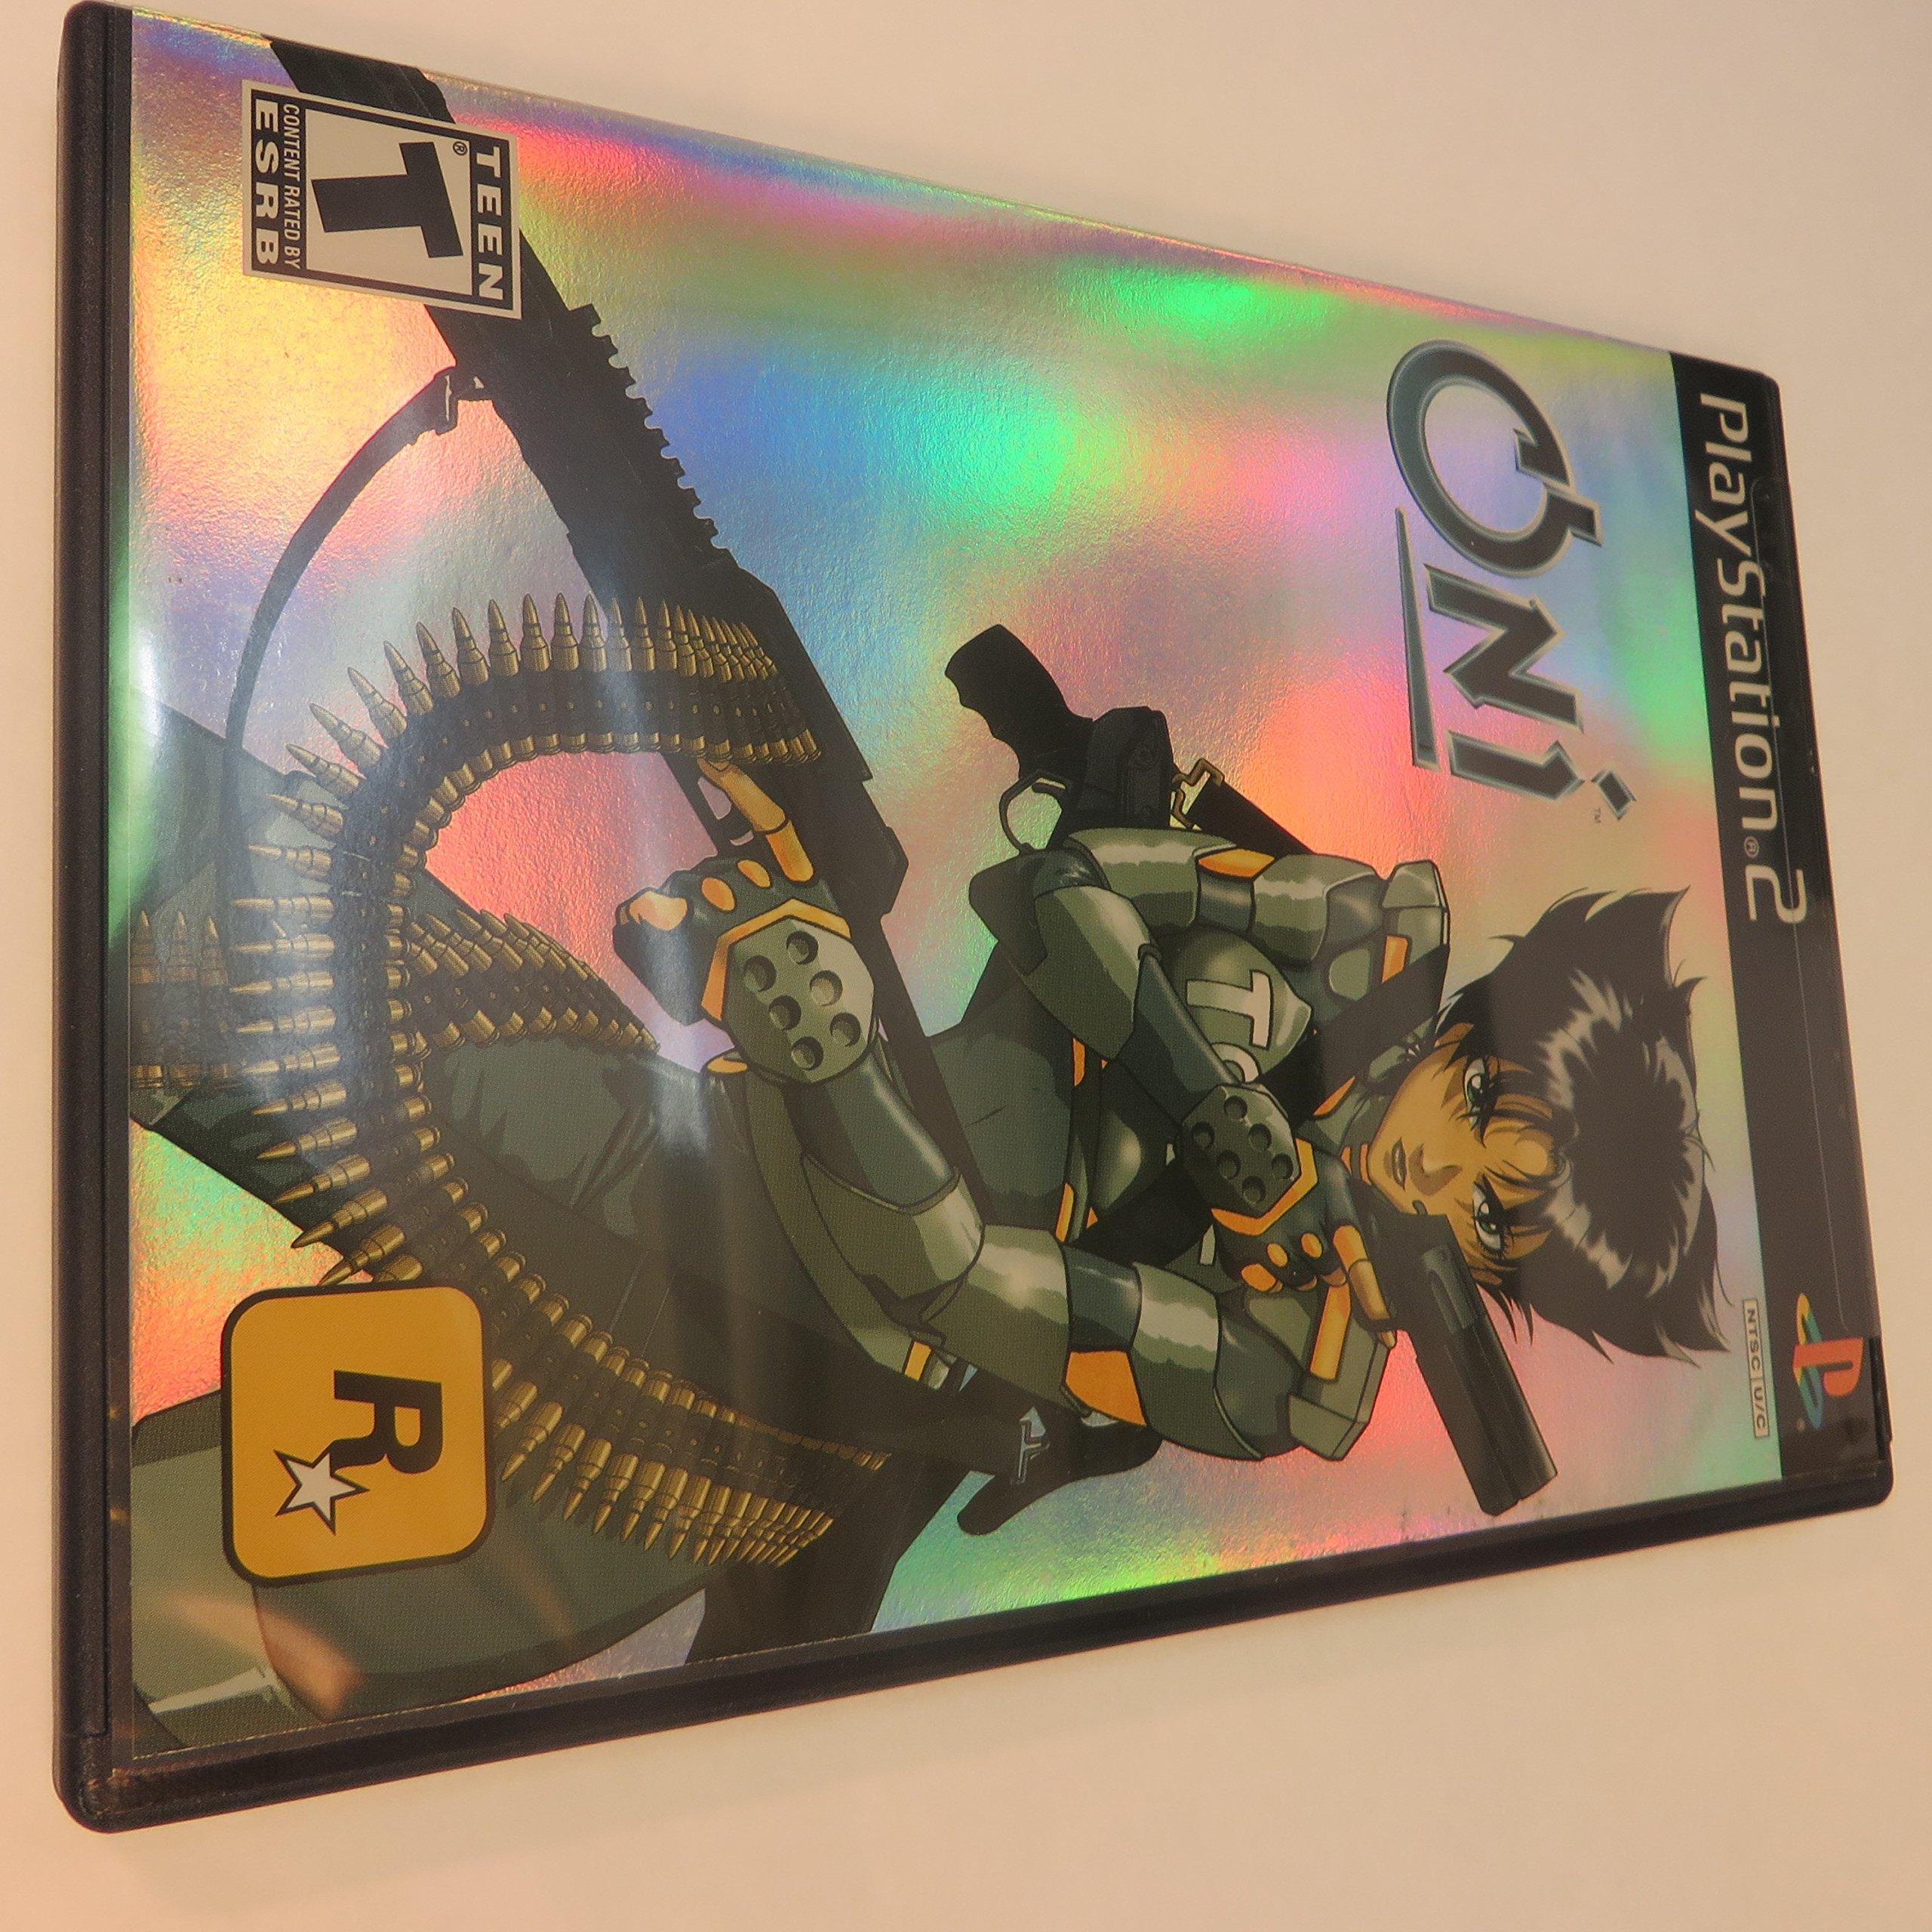 Amazon.com: Oni: Video Games